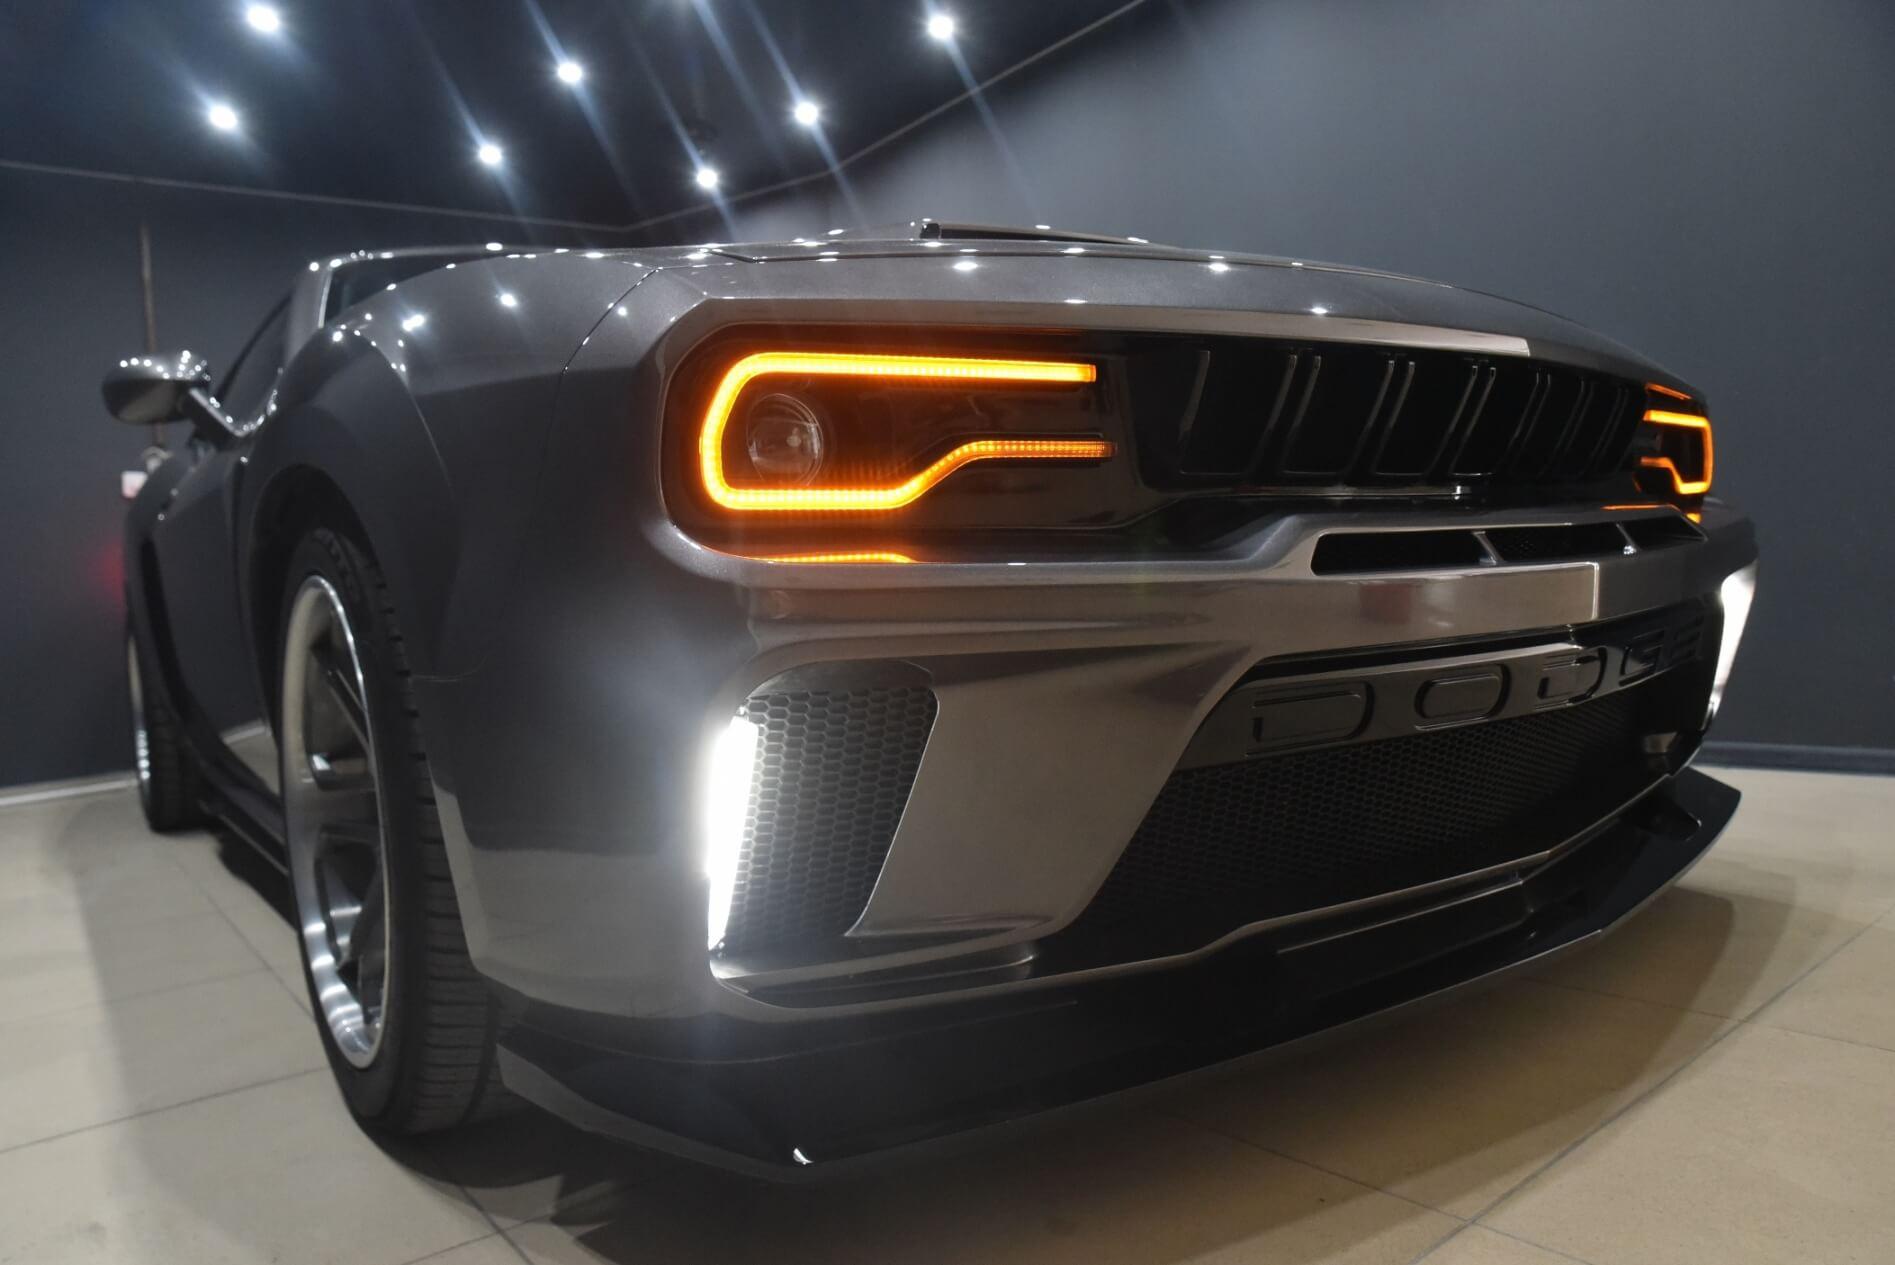 2018 Dodge Challenger >> Dodge Challenger (c) Mad Max 2018 | SCL Performance